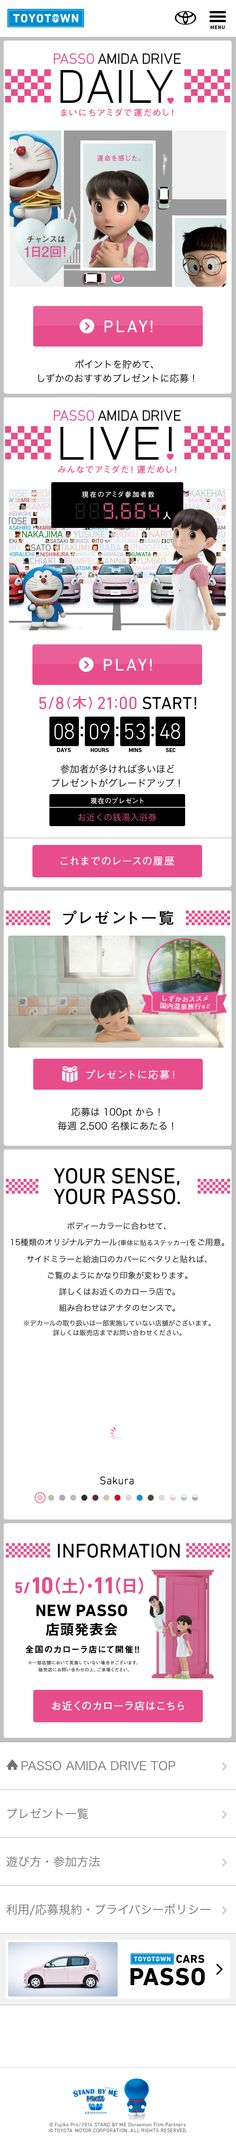 Web Design, Site Design, Mobile Web, Mobile Design, Package Design, Ecommerce, Smartphone, Campaign, Japanese